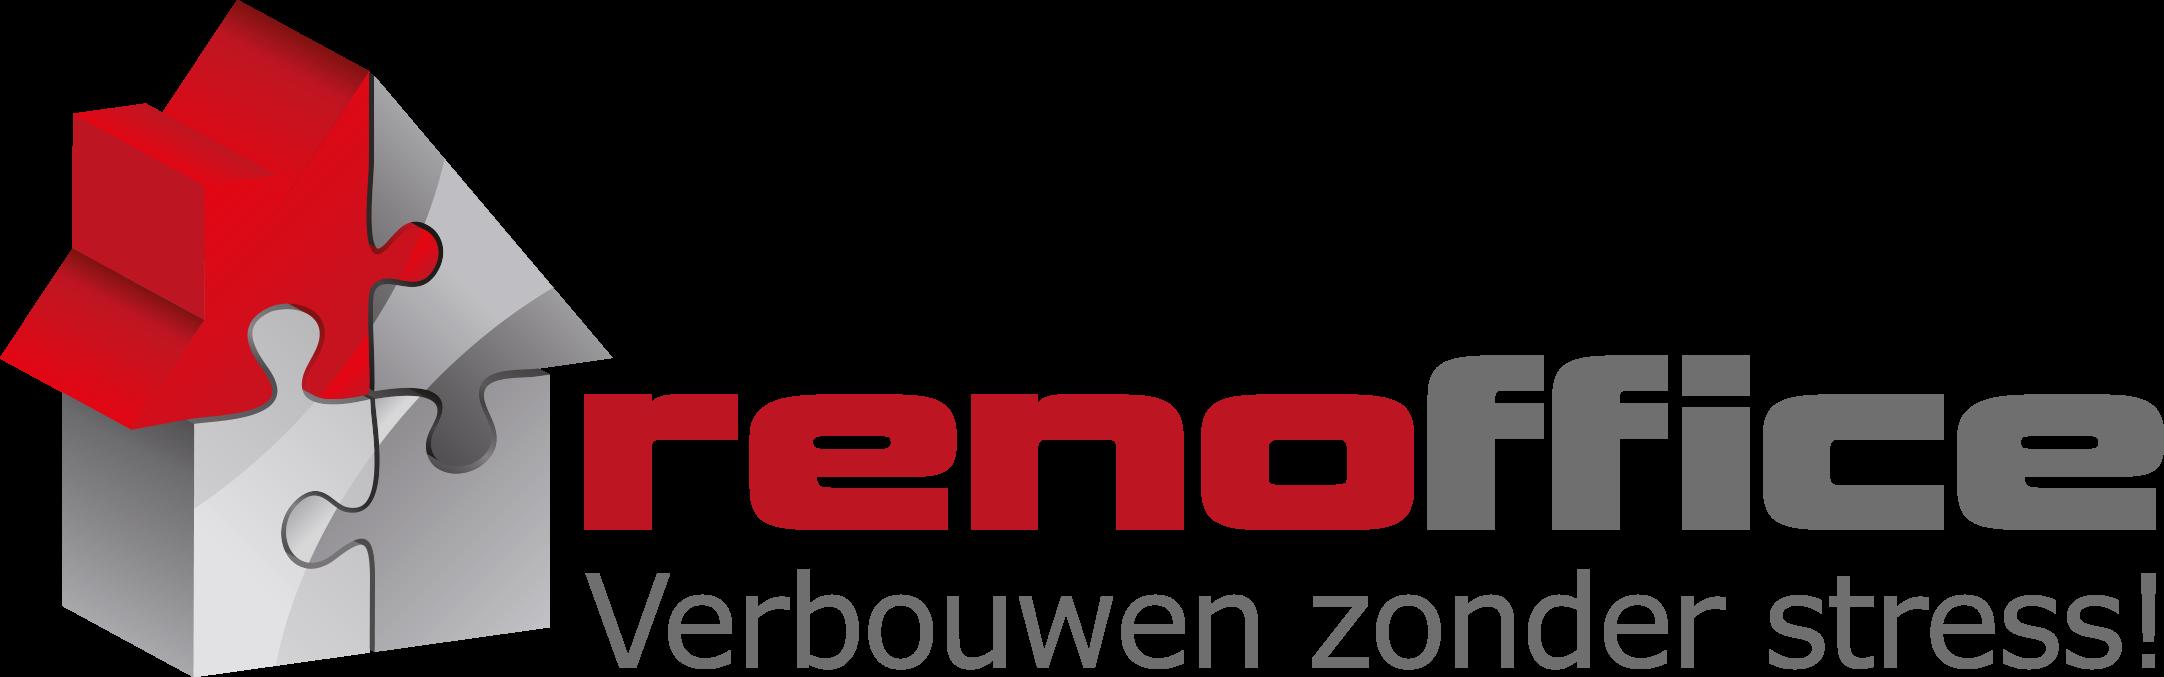 renoffice_logo